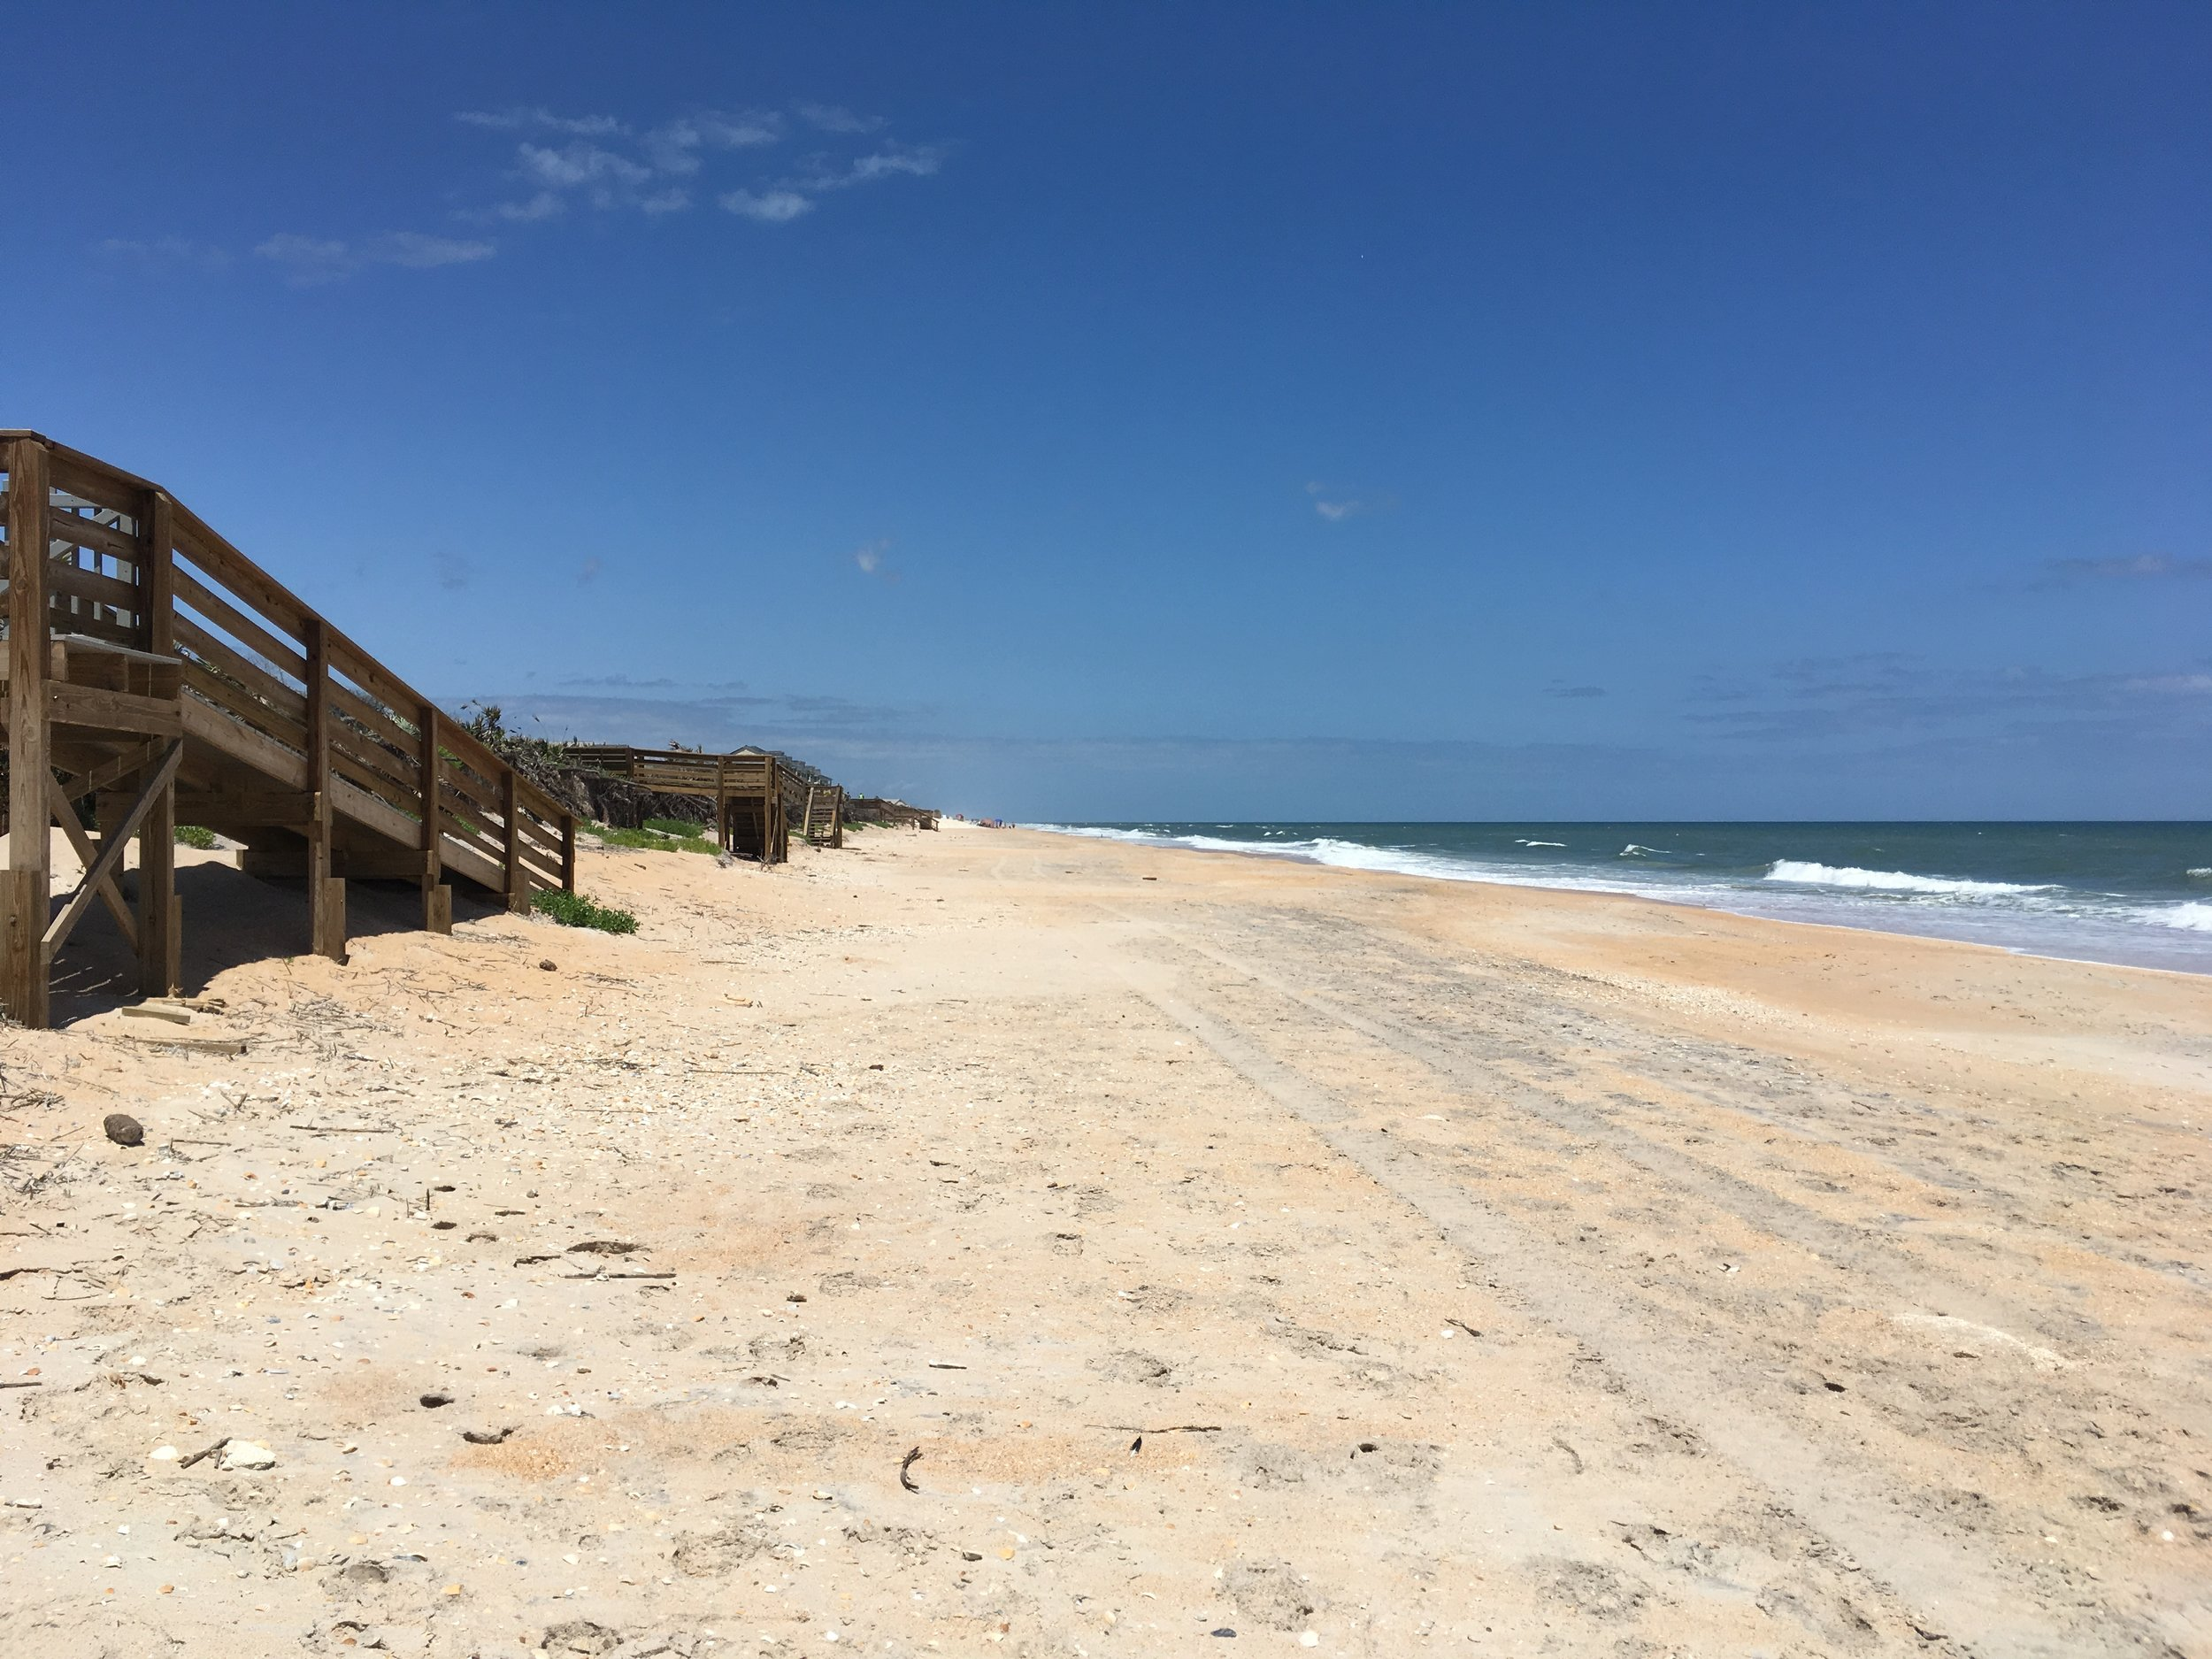 Cinnamon Beach